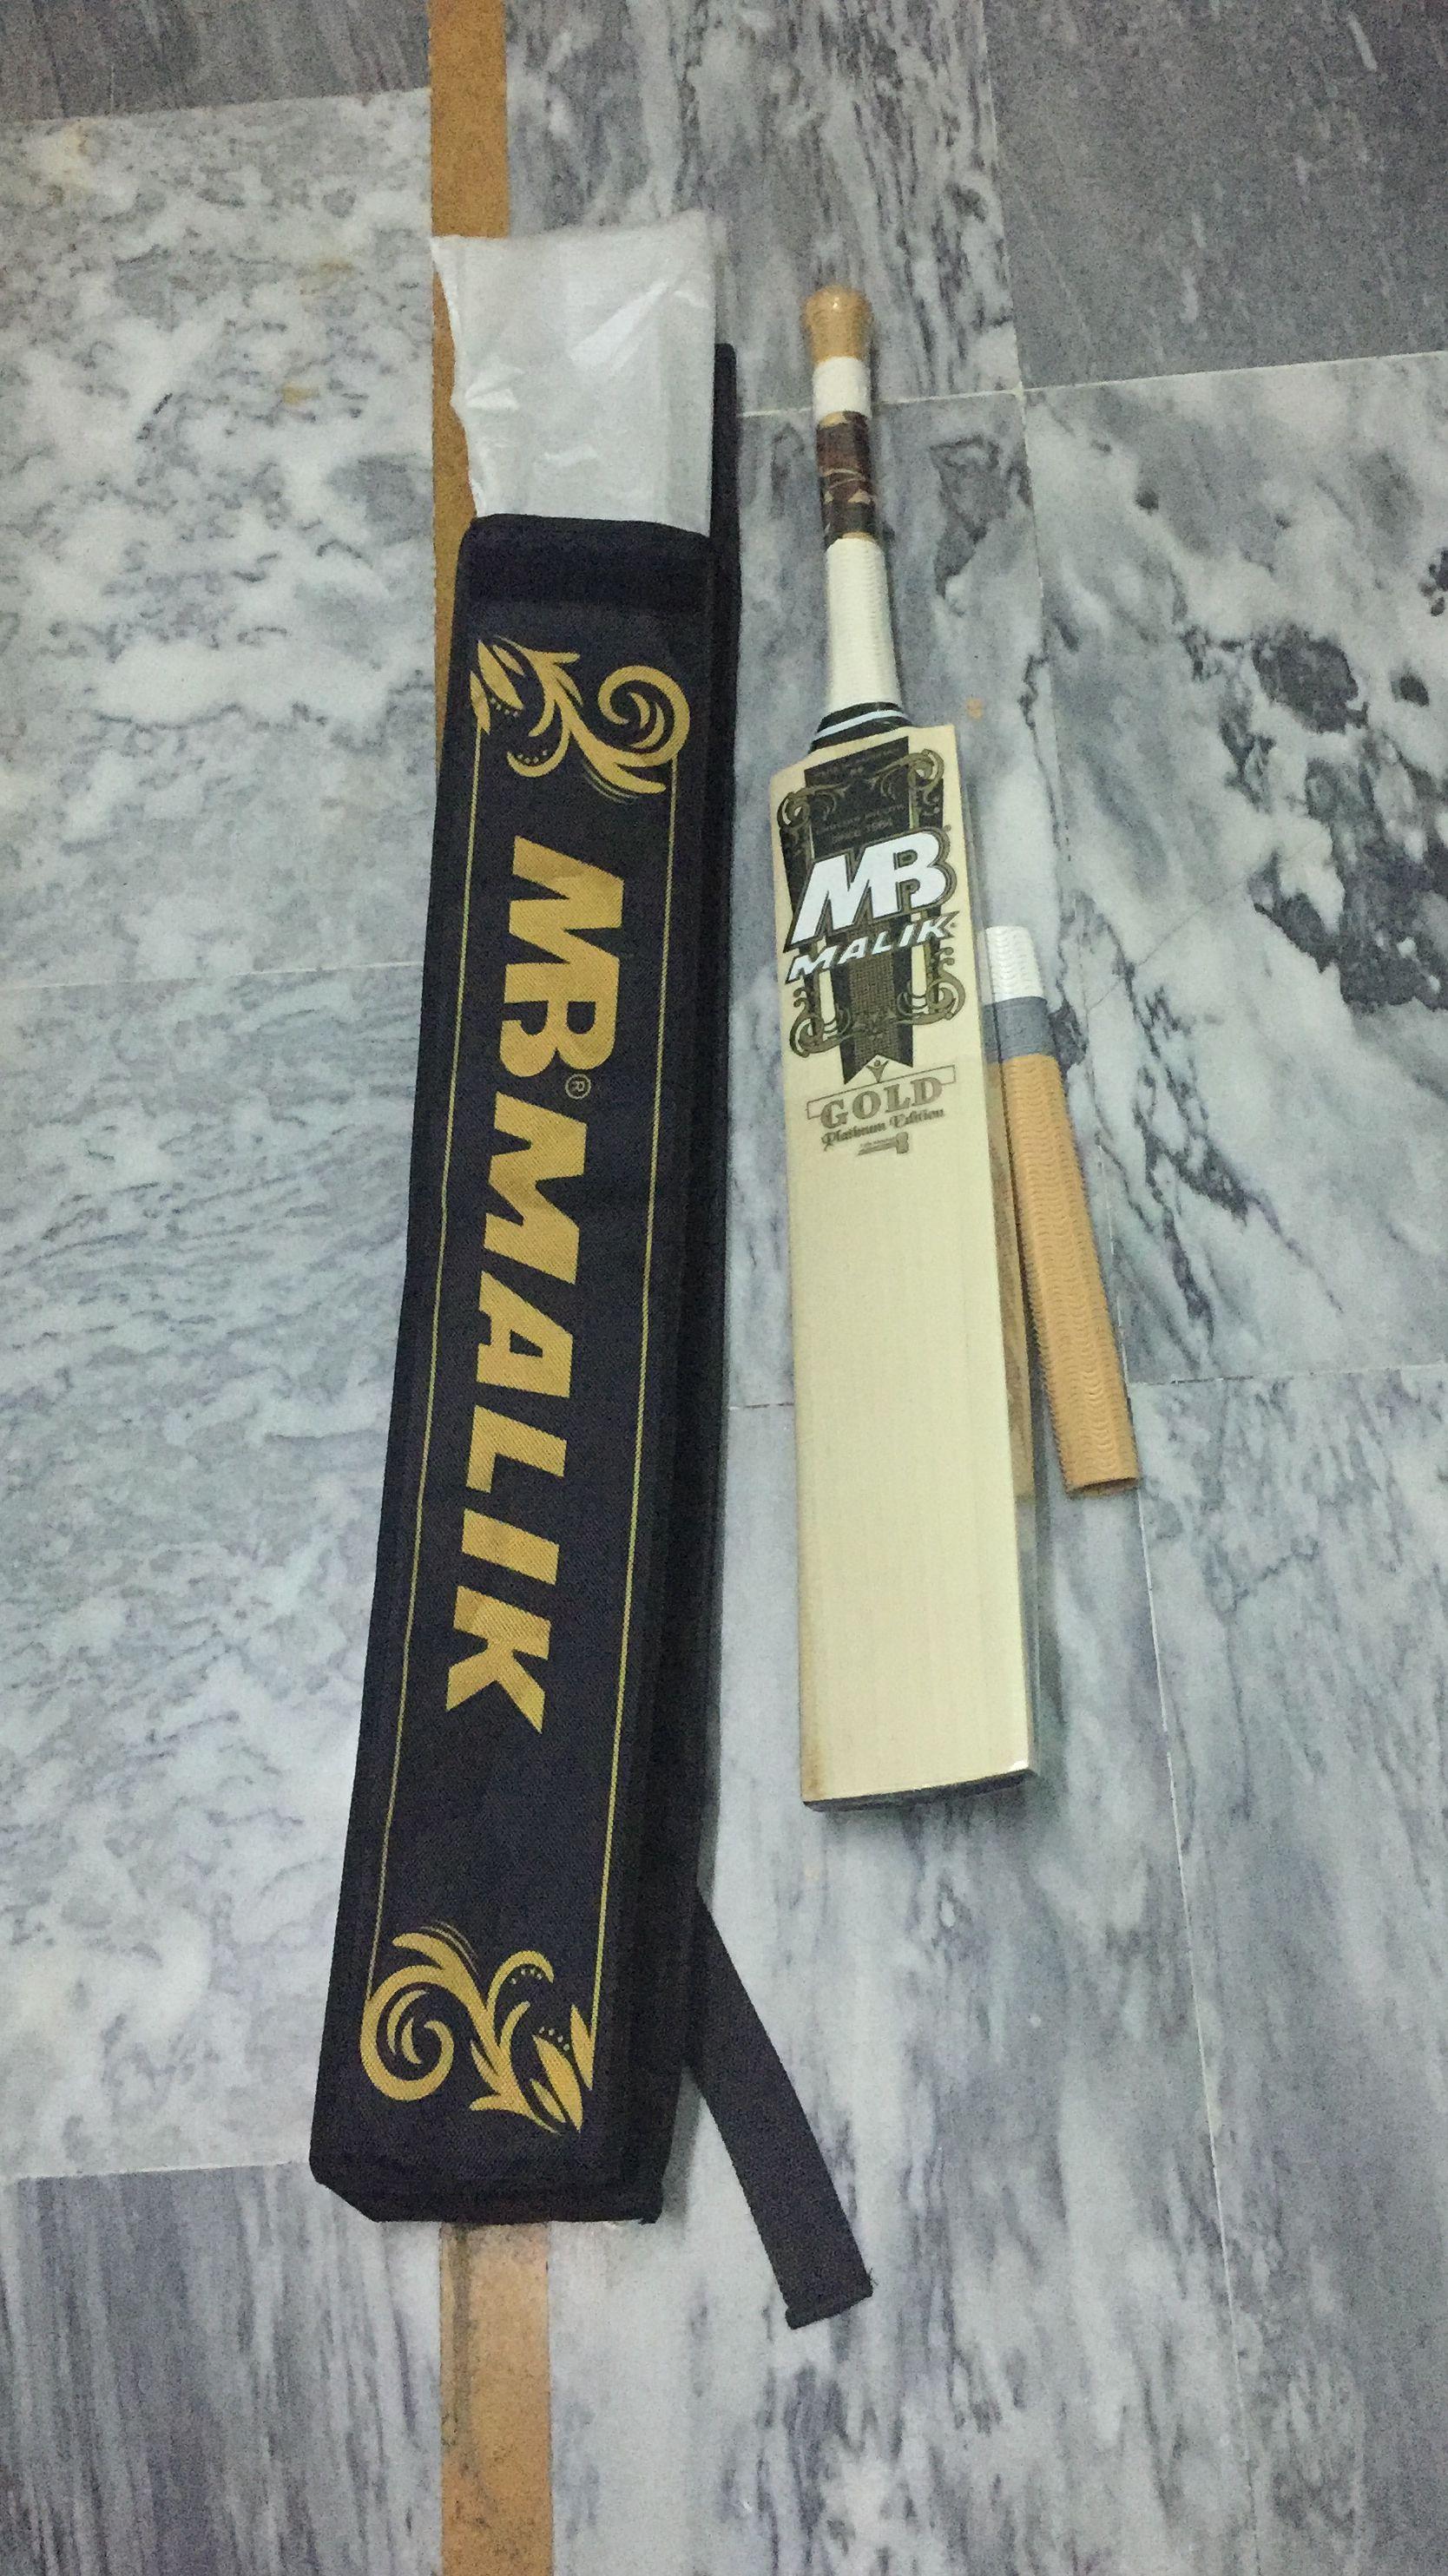 Mb Malik Gold Platinum Edition Cricket Bat Cricket Bat Gold Platinum Pakistan Cricket Team